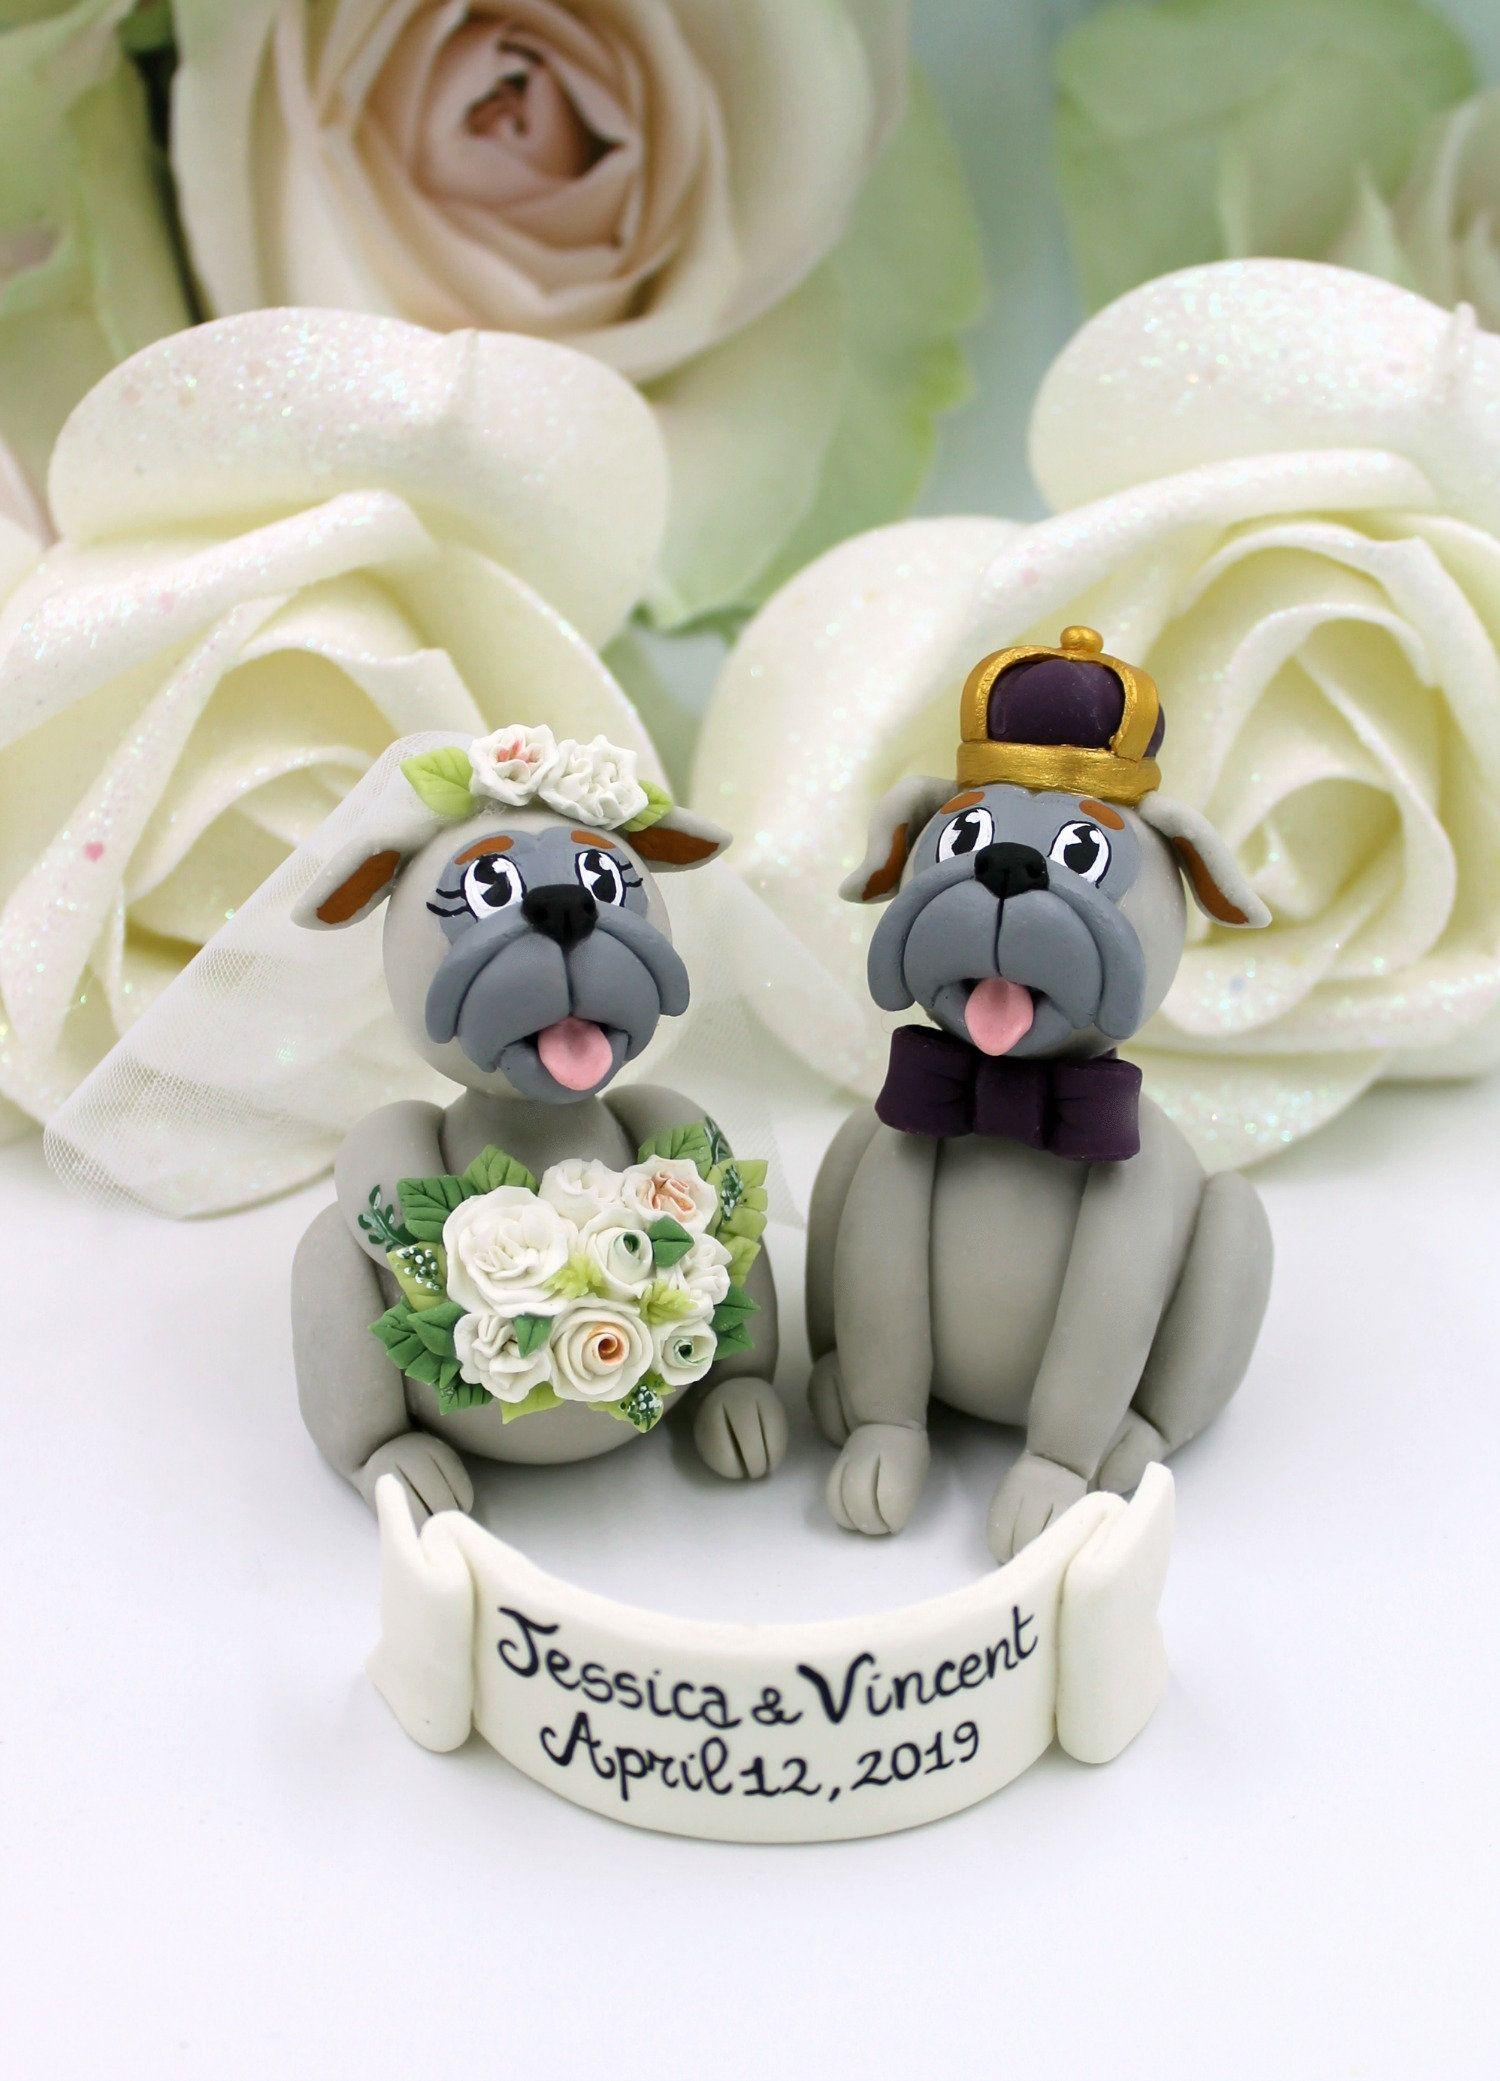 College Mascot Wedding Cake Topper Dog Cake Topper Wedding Etsy Wedding Cake Toppers Wedding Cake Topper Figurines Dog Cake Topper